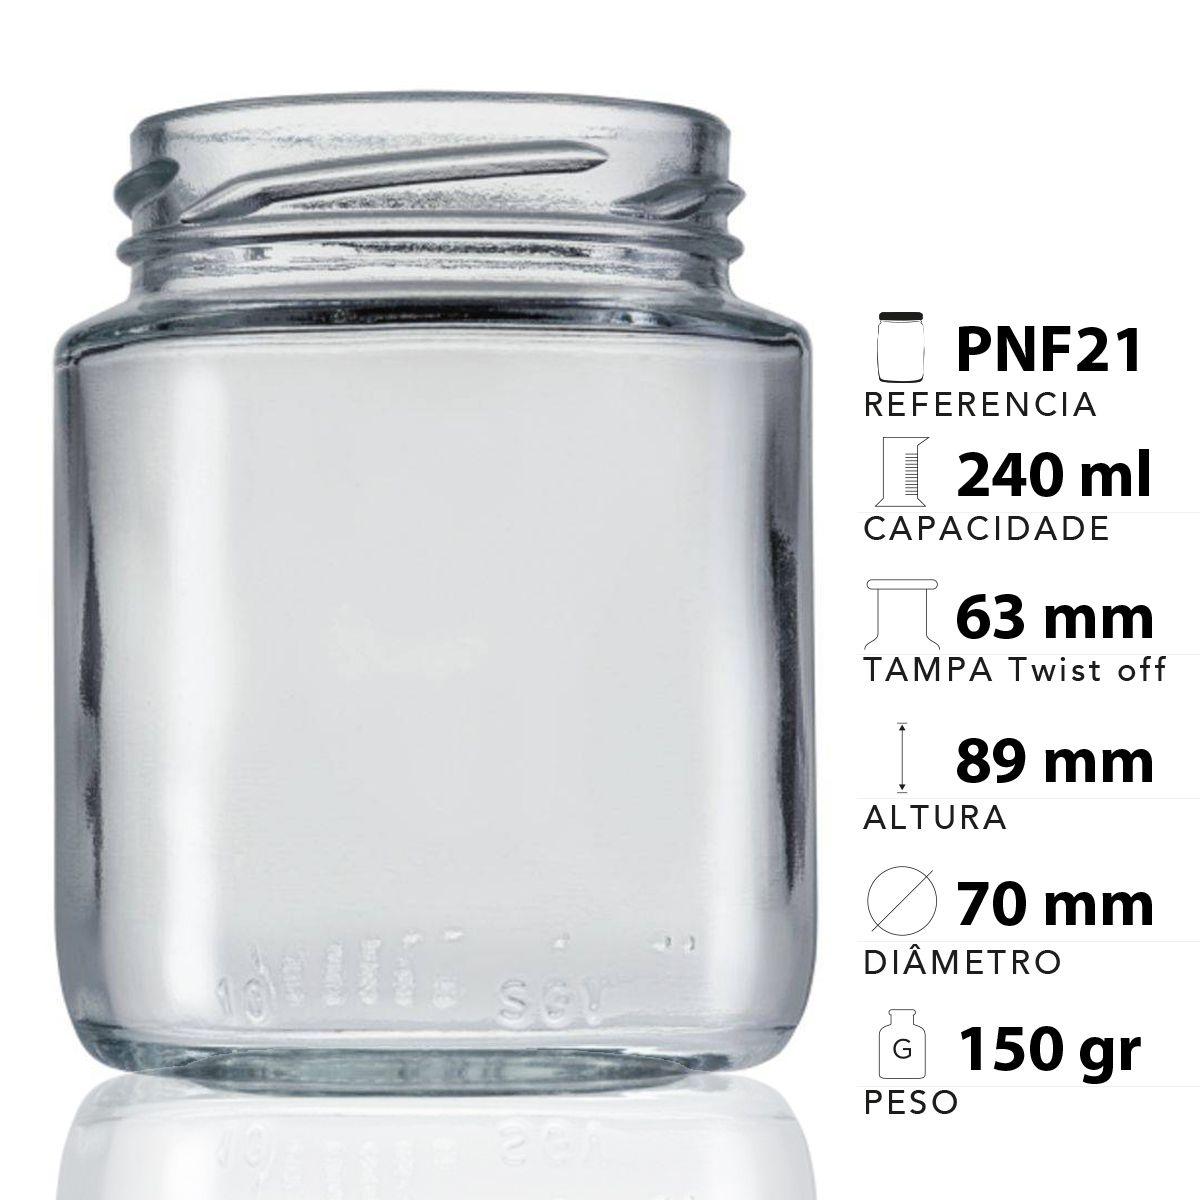 24 Potes De Vidro Belém 240 Ml Com Tampa Preta + Lacre  - EMPÓRIO PACK